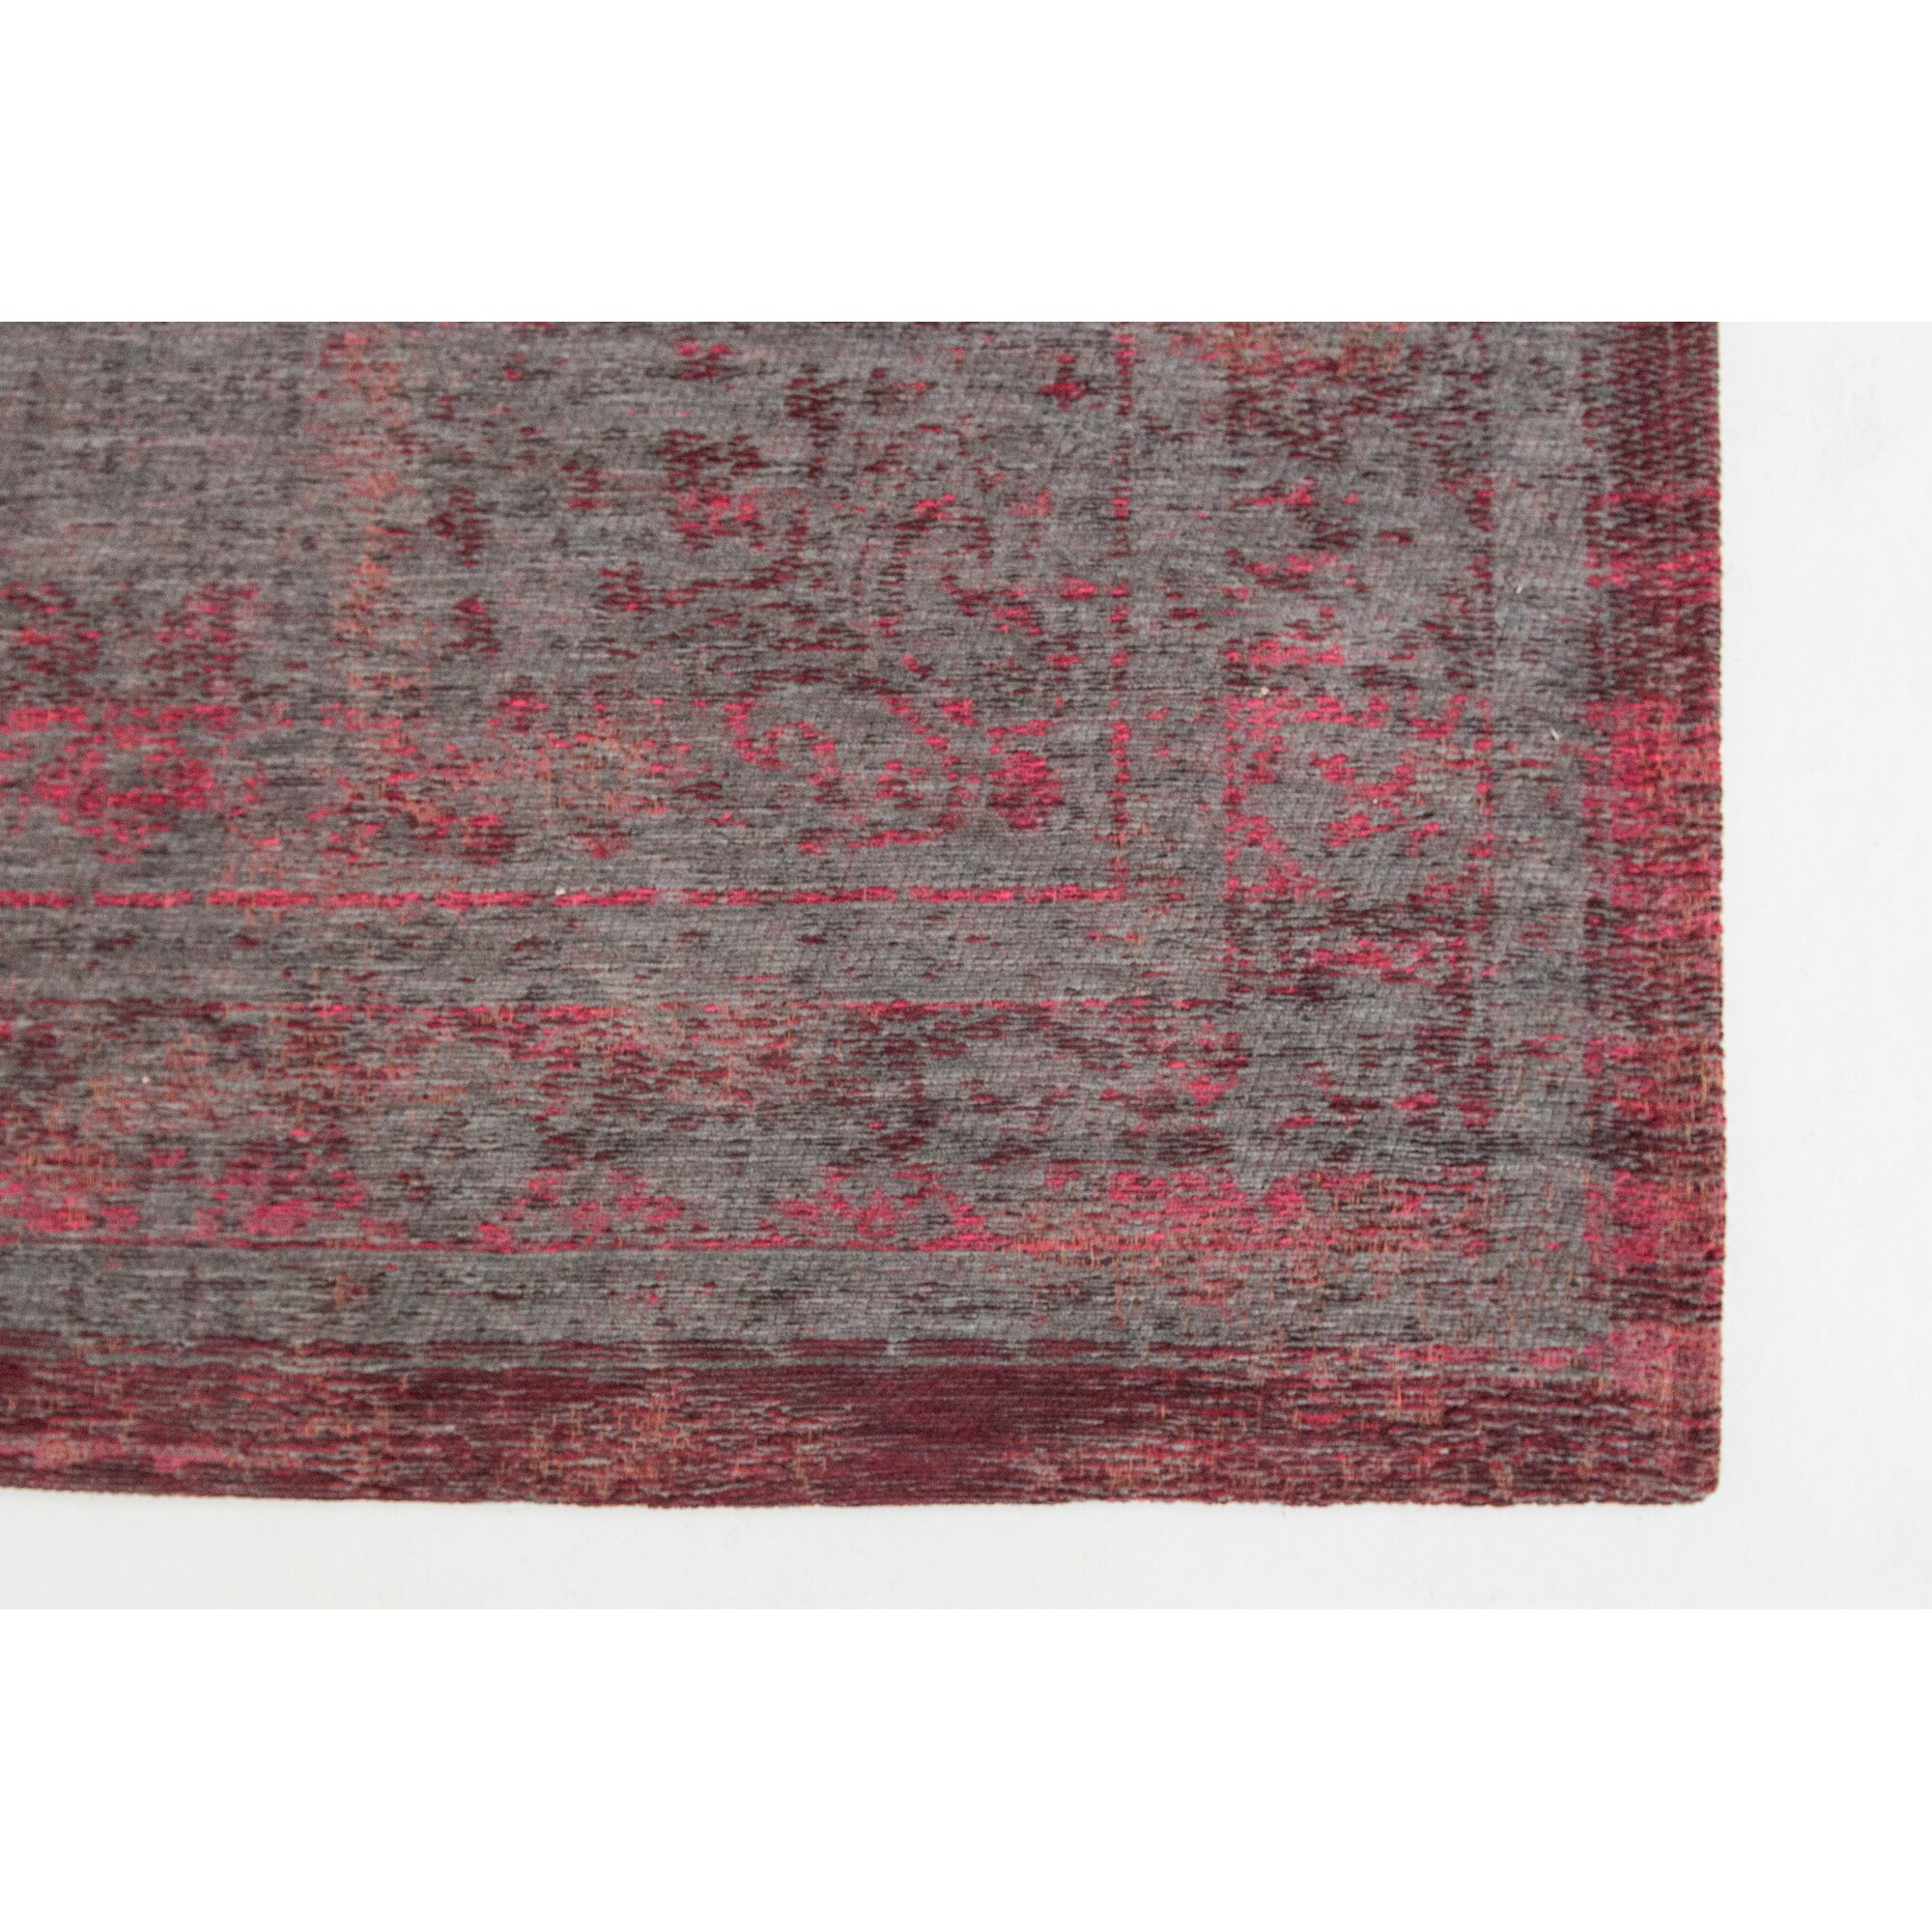 teppich grau rosa teppich rosa grau haus ideen lorena. Black Bedroom Furniture Sets. Home Design Ideas